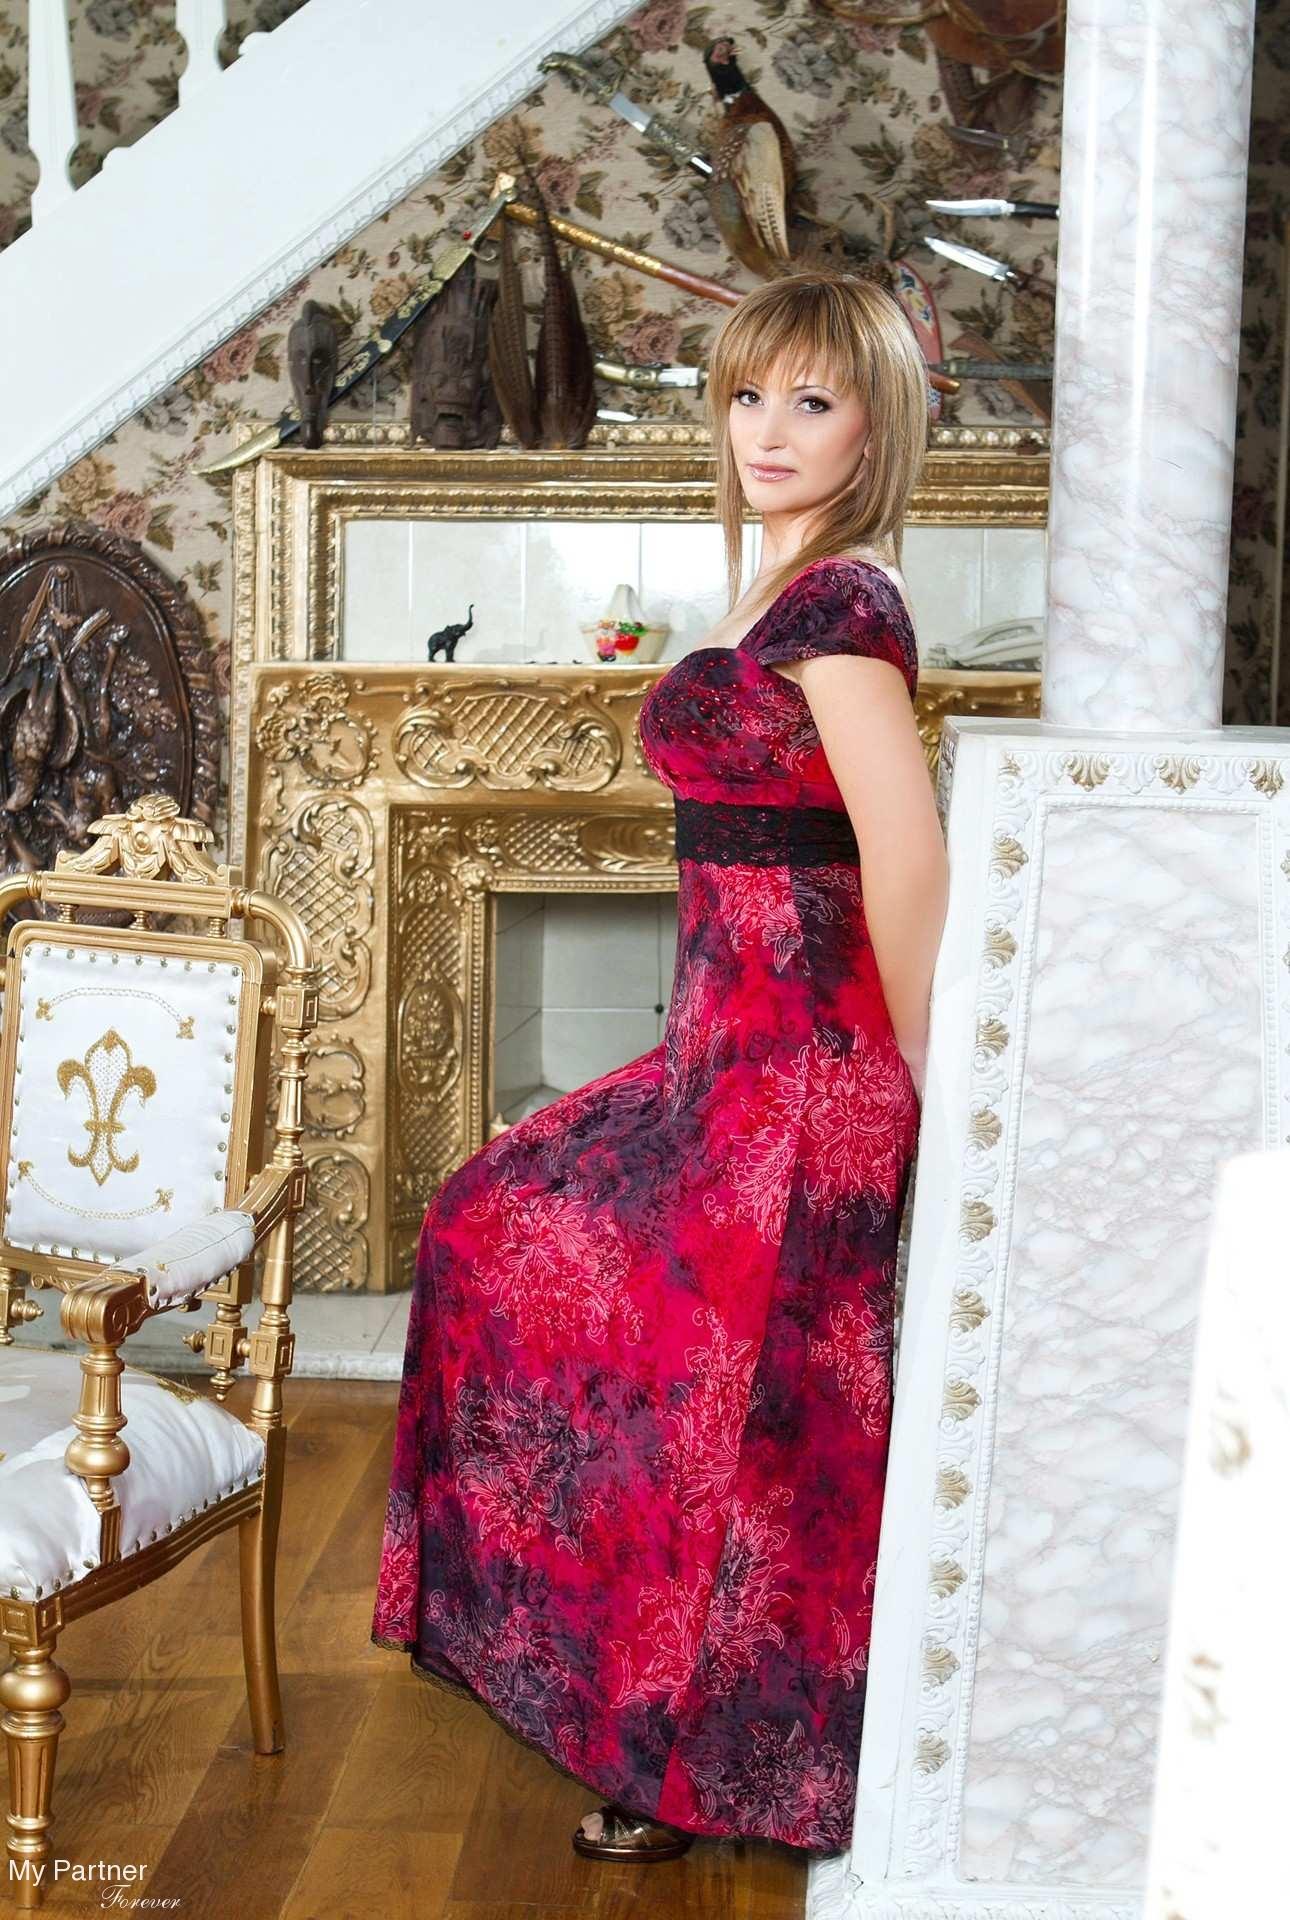 International Marriage Agency to Meet Irina from Odessa, Ukraine